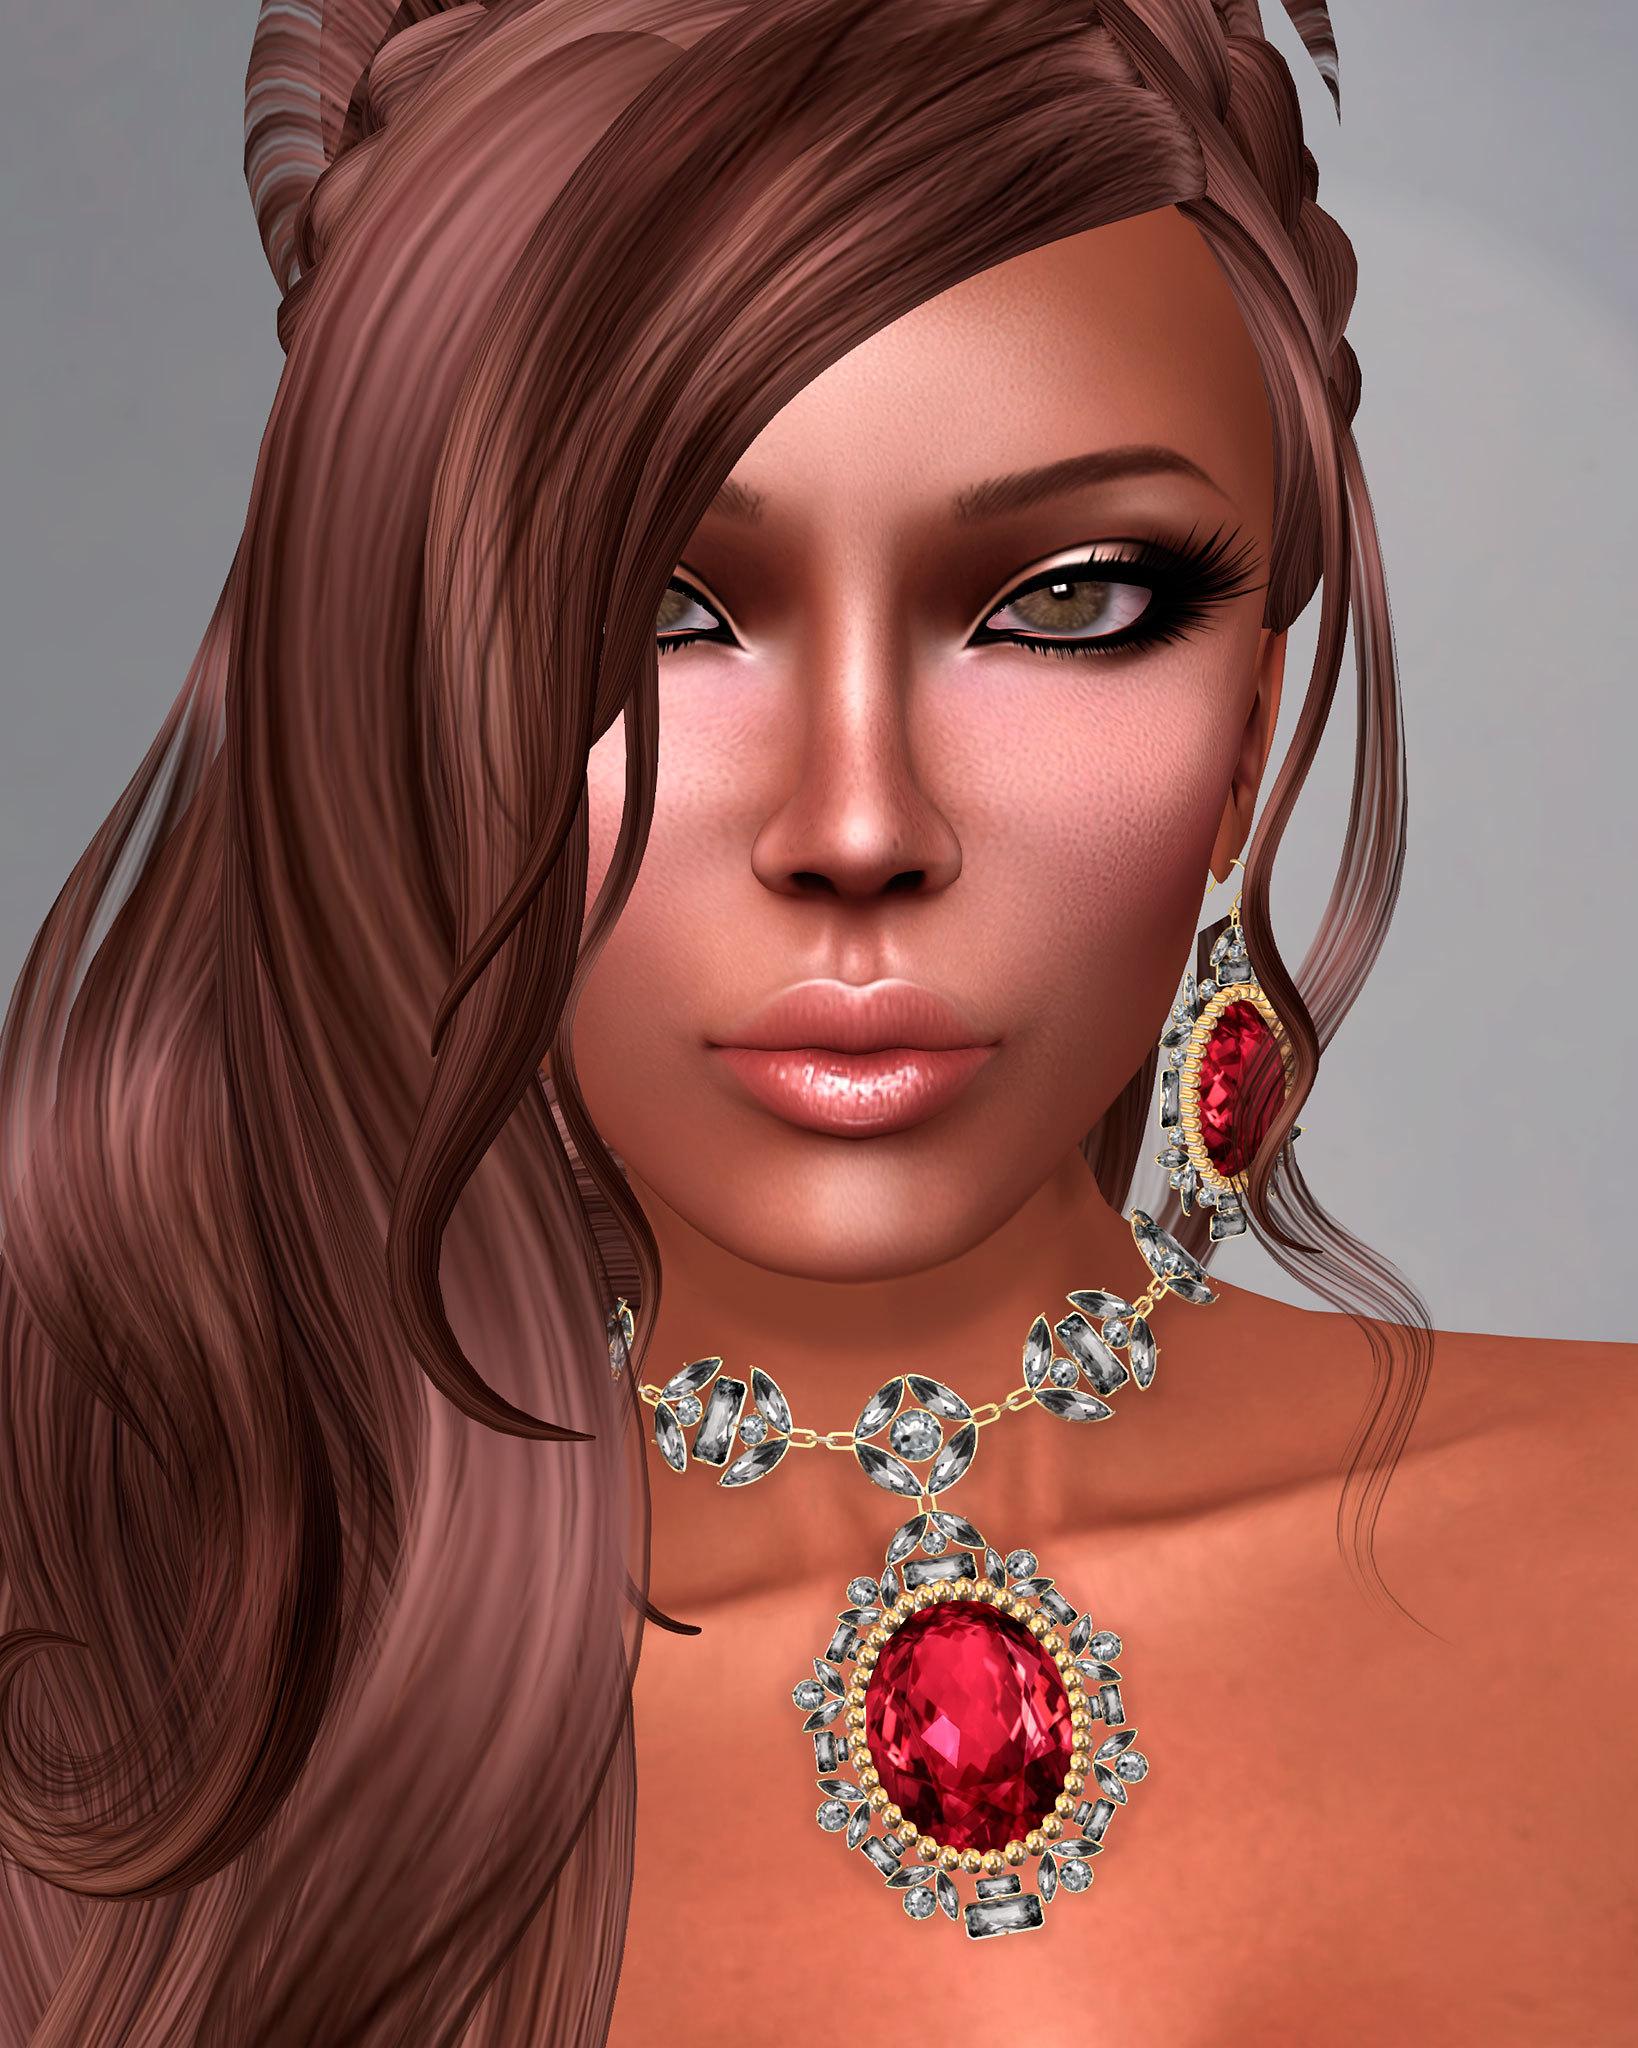 Gaeline-Adriana--mesh-head